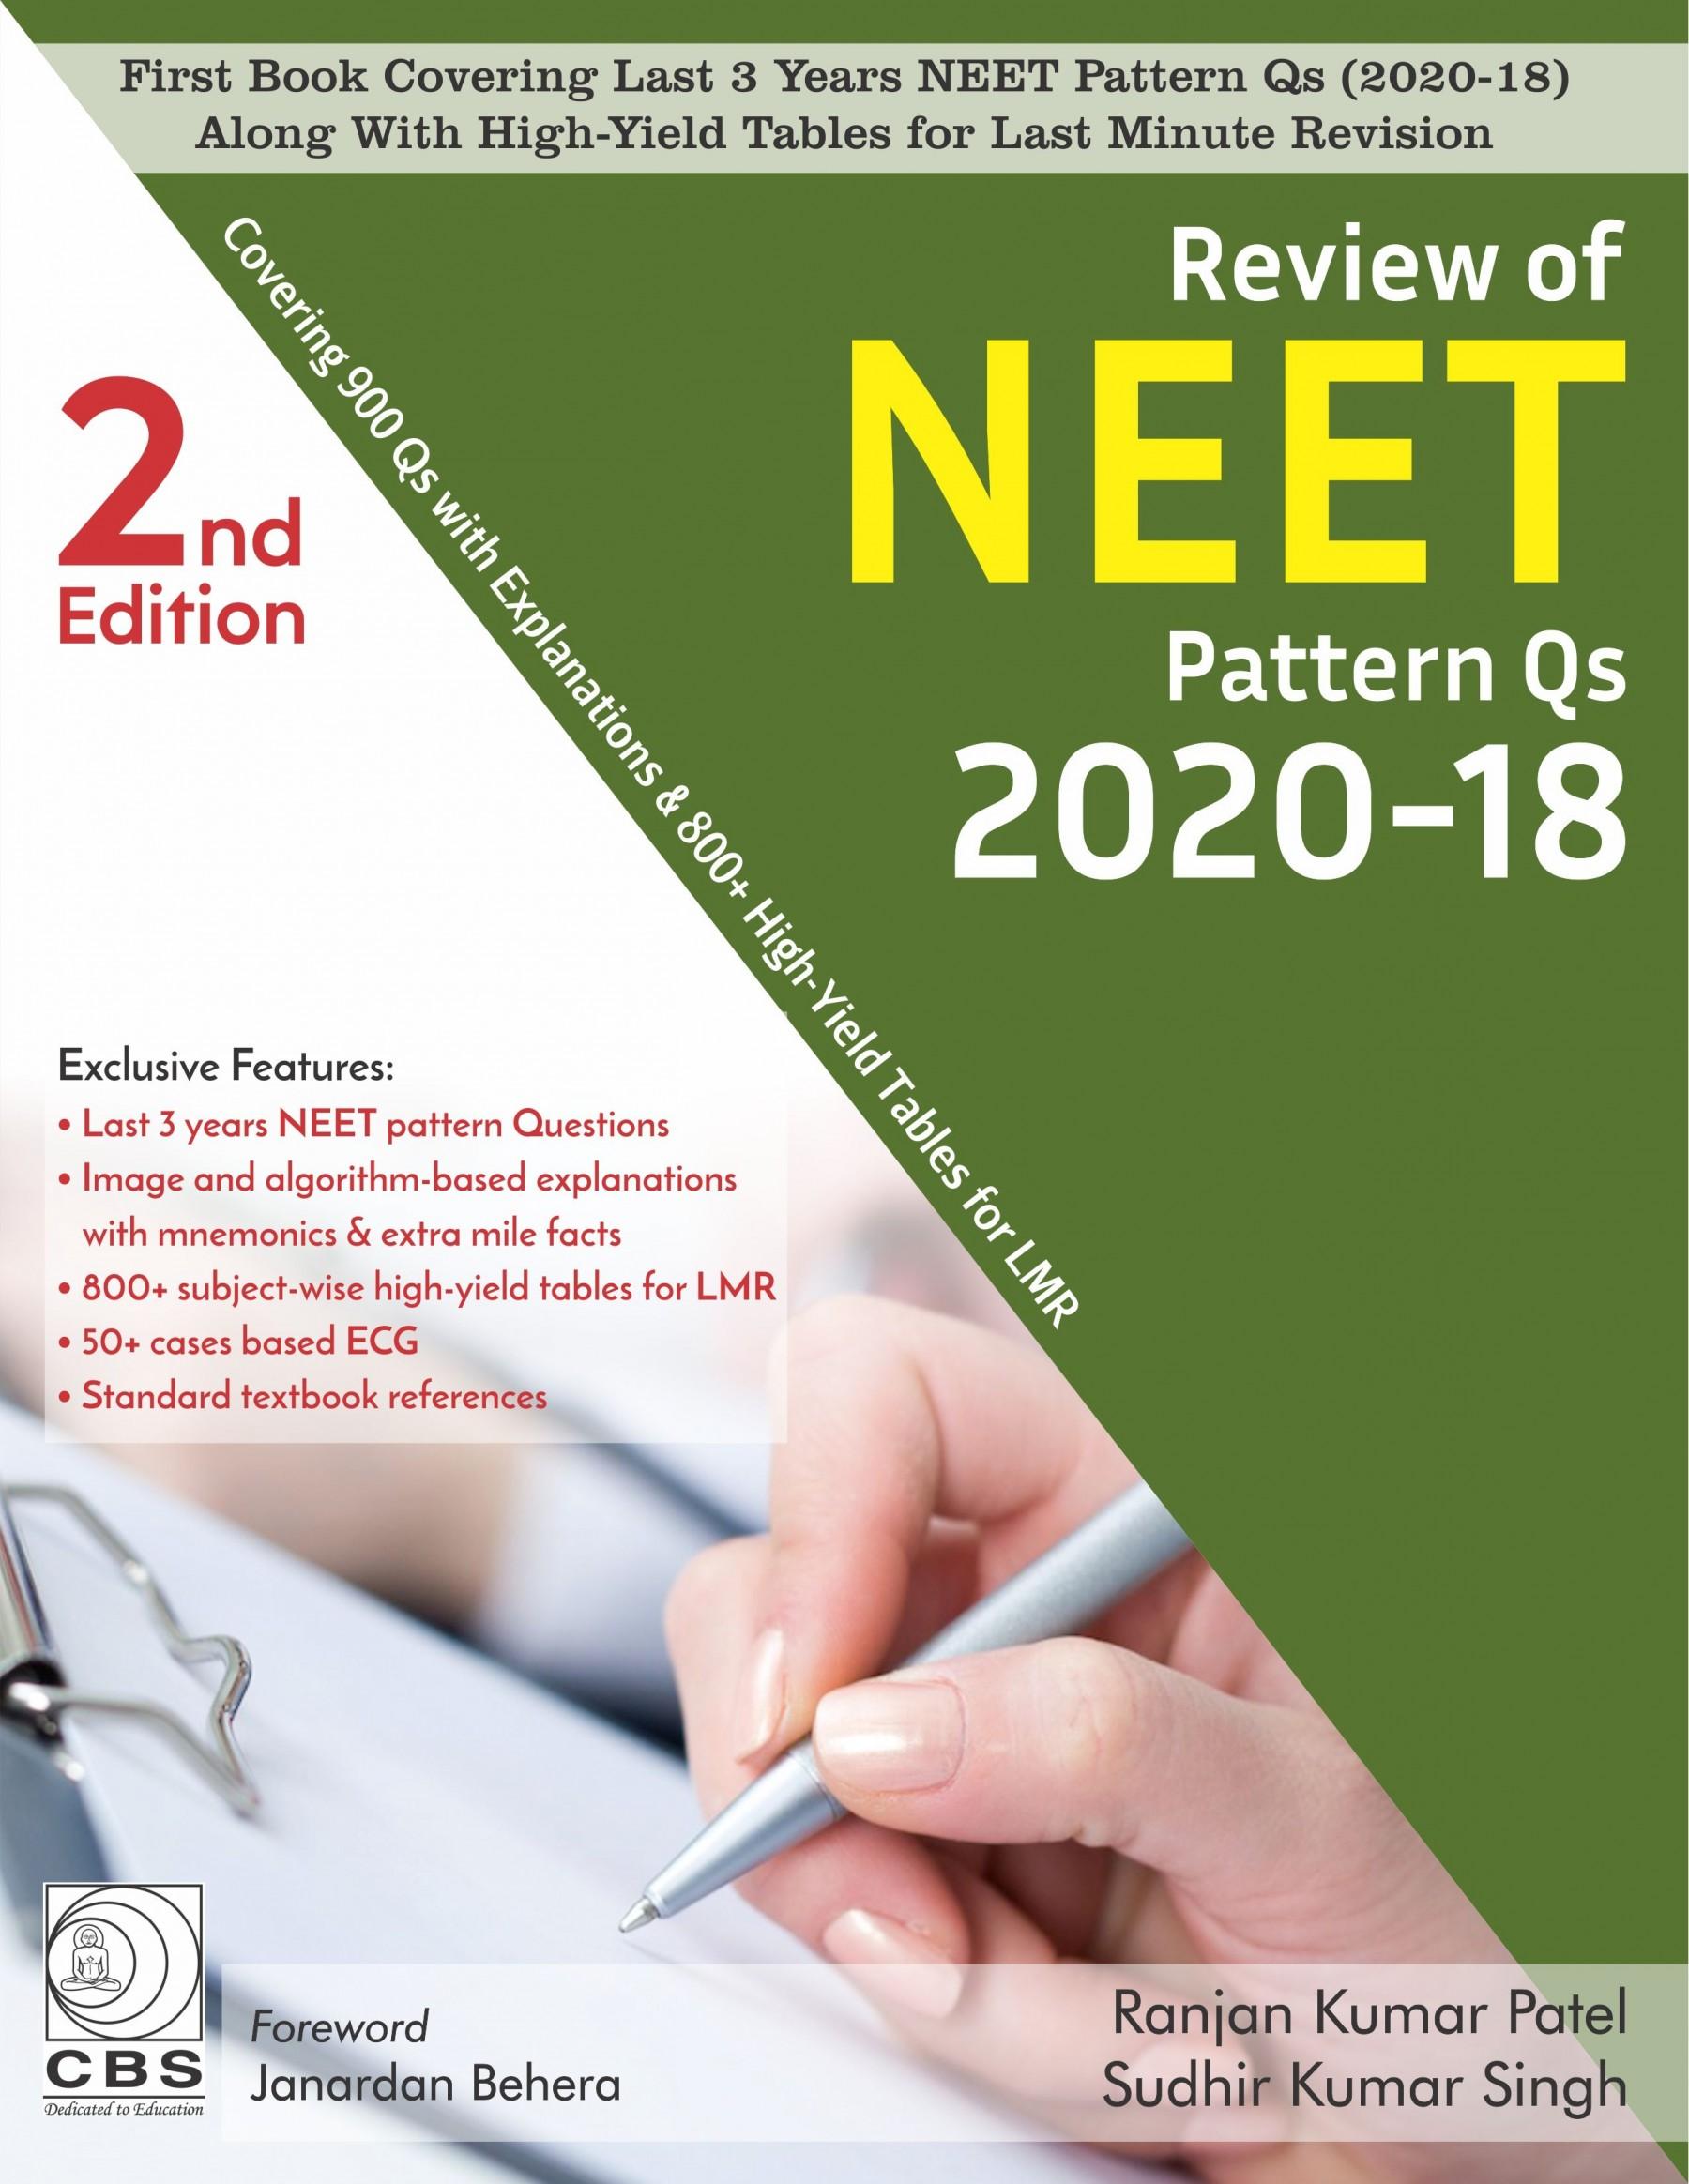 Review of NEET Pattern Qs 2020-18-9788194578369-Ranjan Kumar Patel Sudhir Kumar Singh